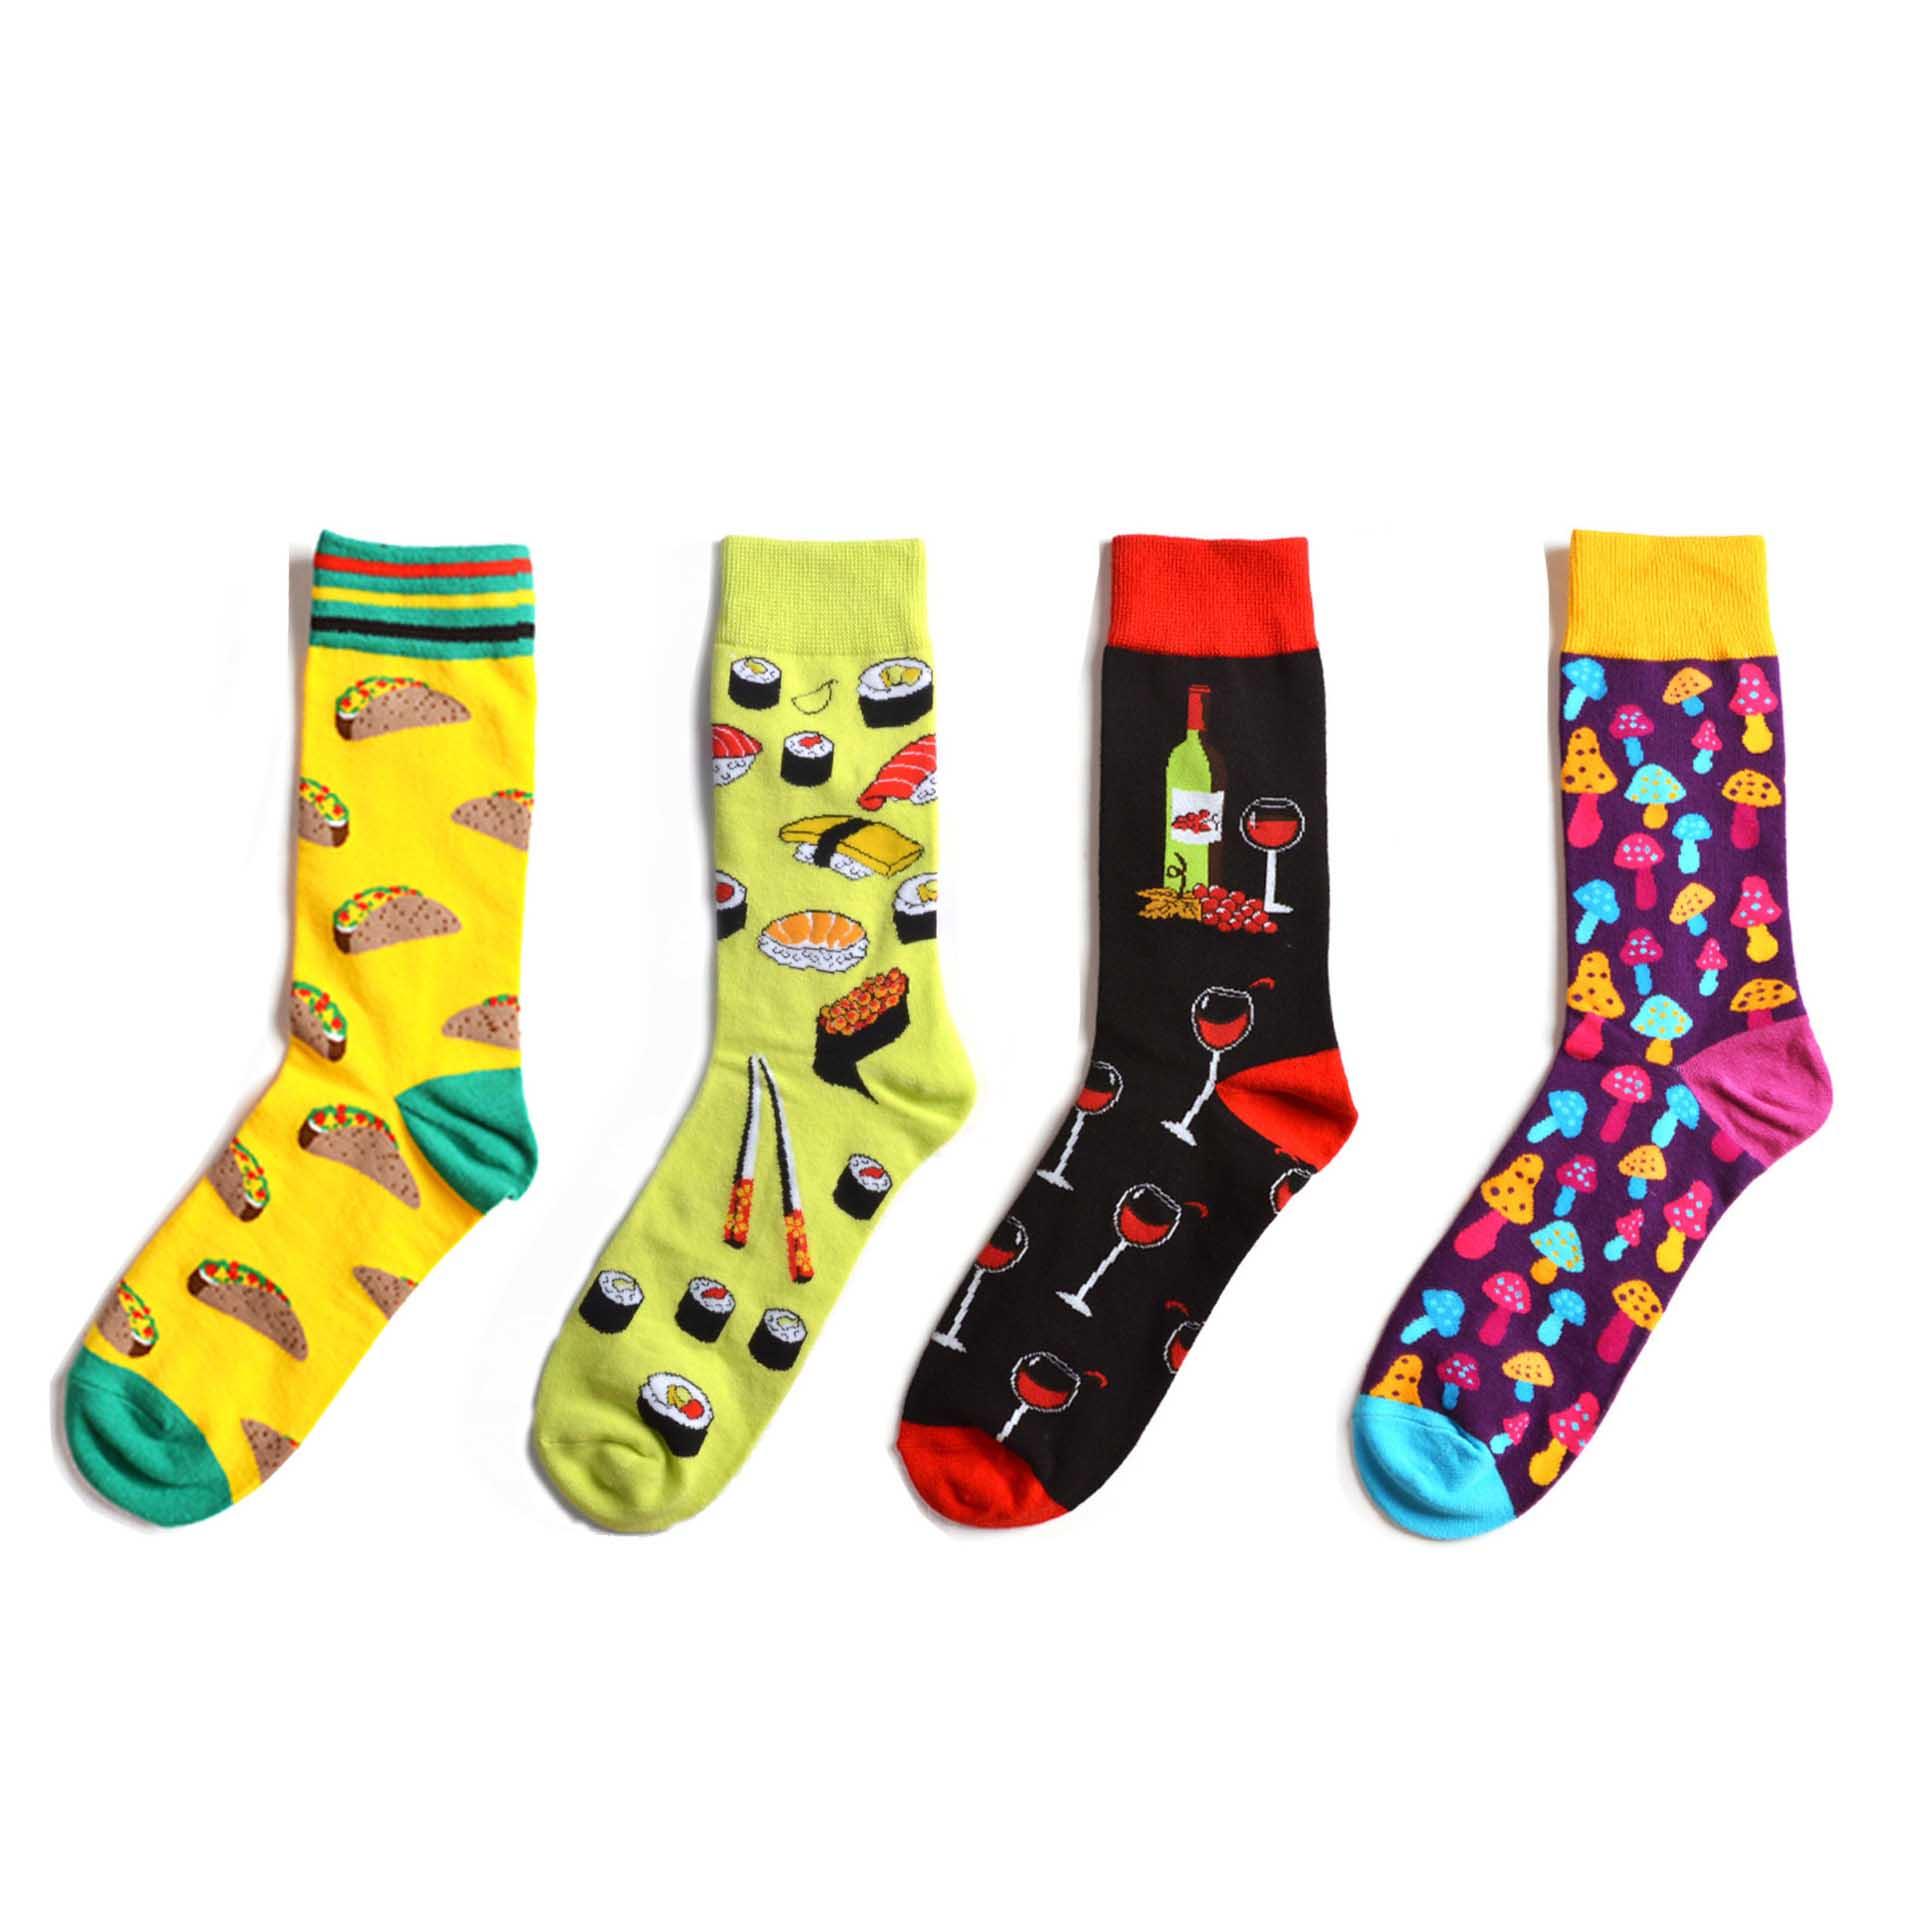 Fashion Harajuku Hip Hop Street Trend Men Women Cotton Socks Sushi Mushroom Novelty Pattern Happy Casual Skate Socks